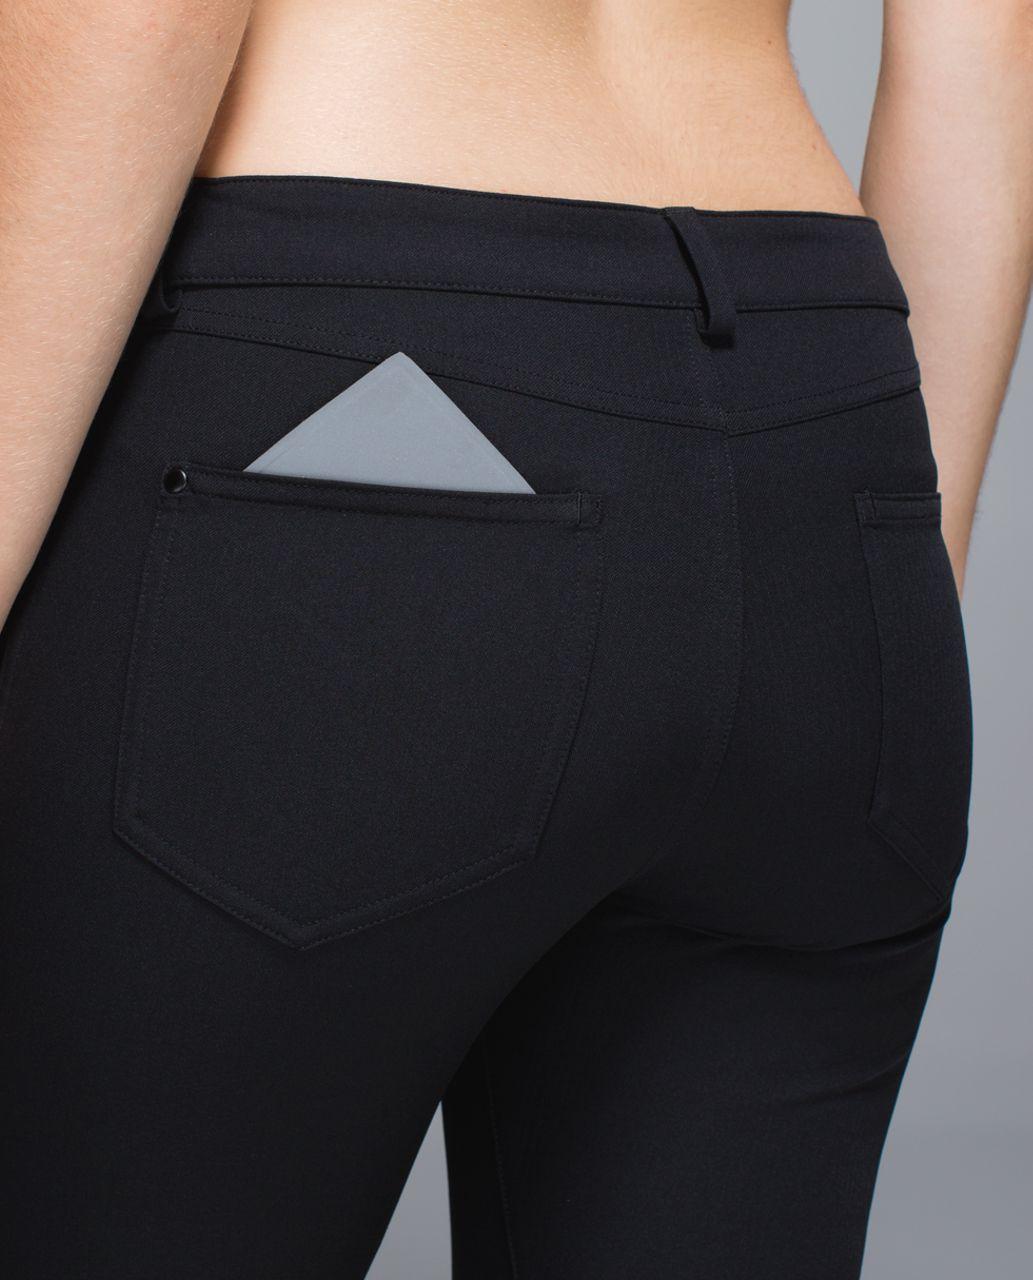 Lululemon Everyday Pant - Black